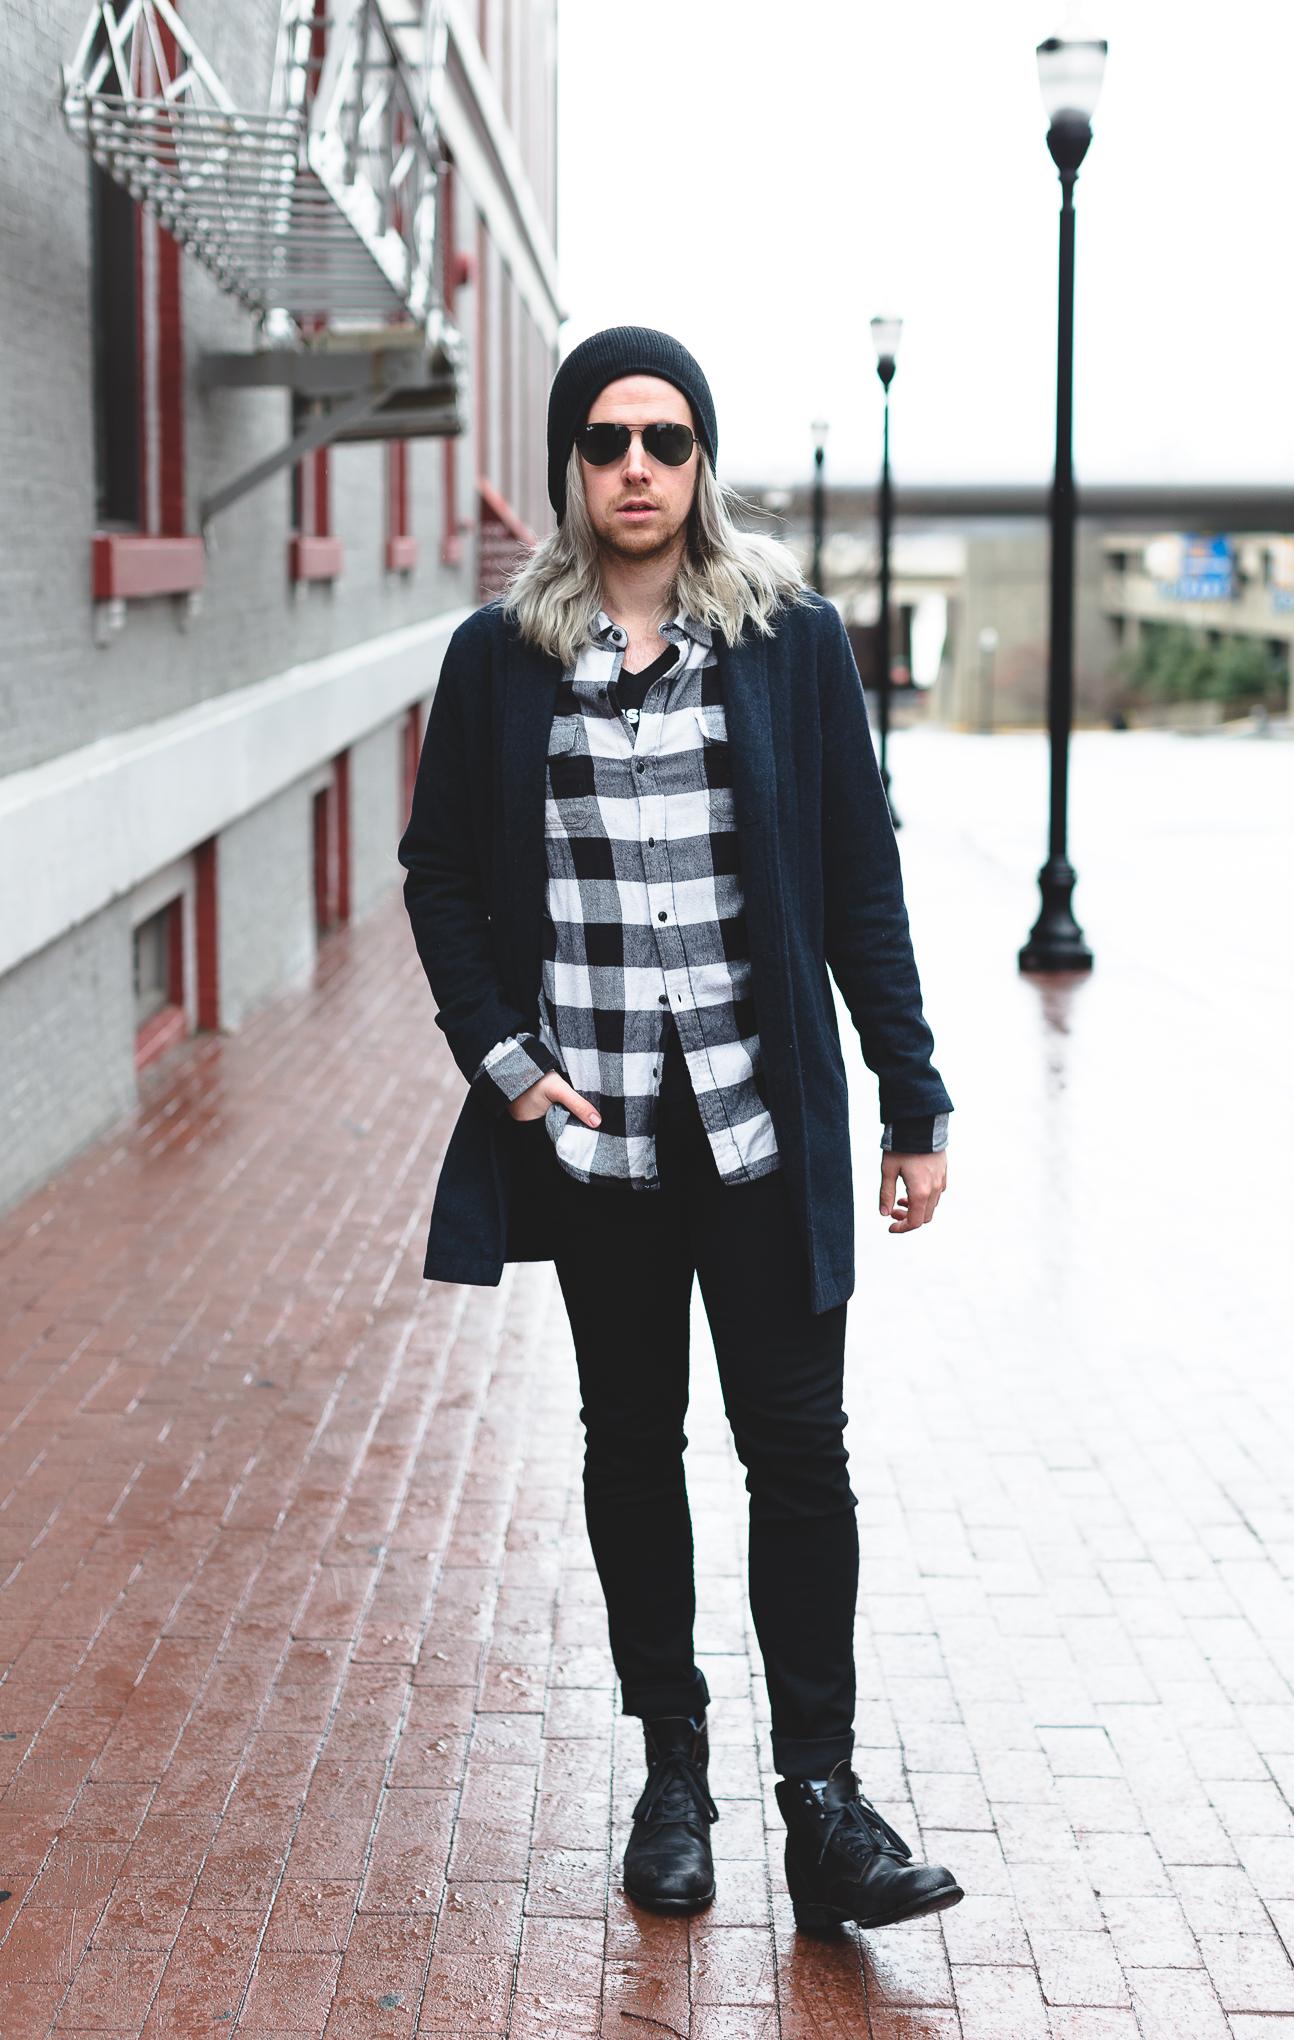 topman, mens fashion blog, mens fashion blogger, rag and bone, black skinny jeans for men